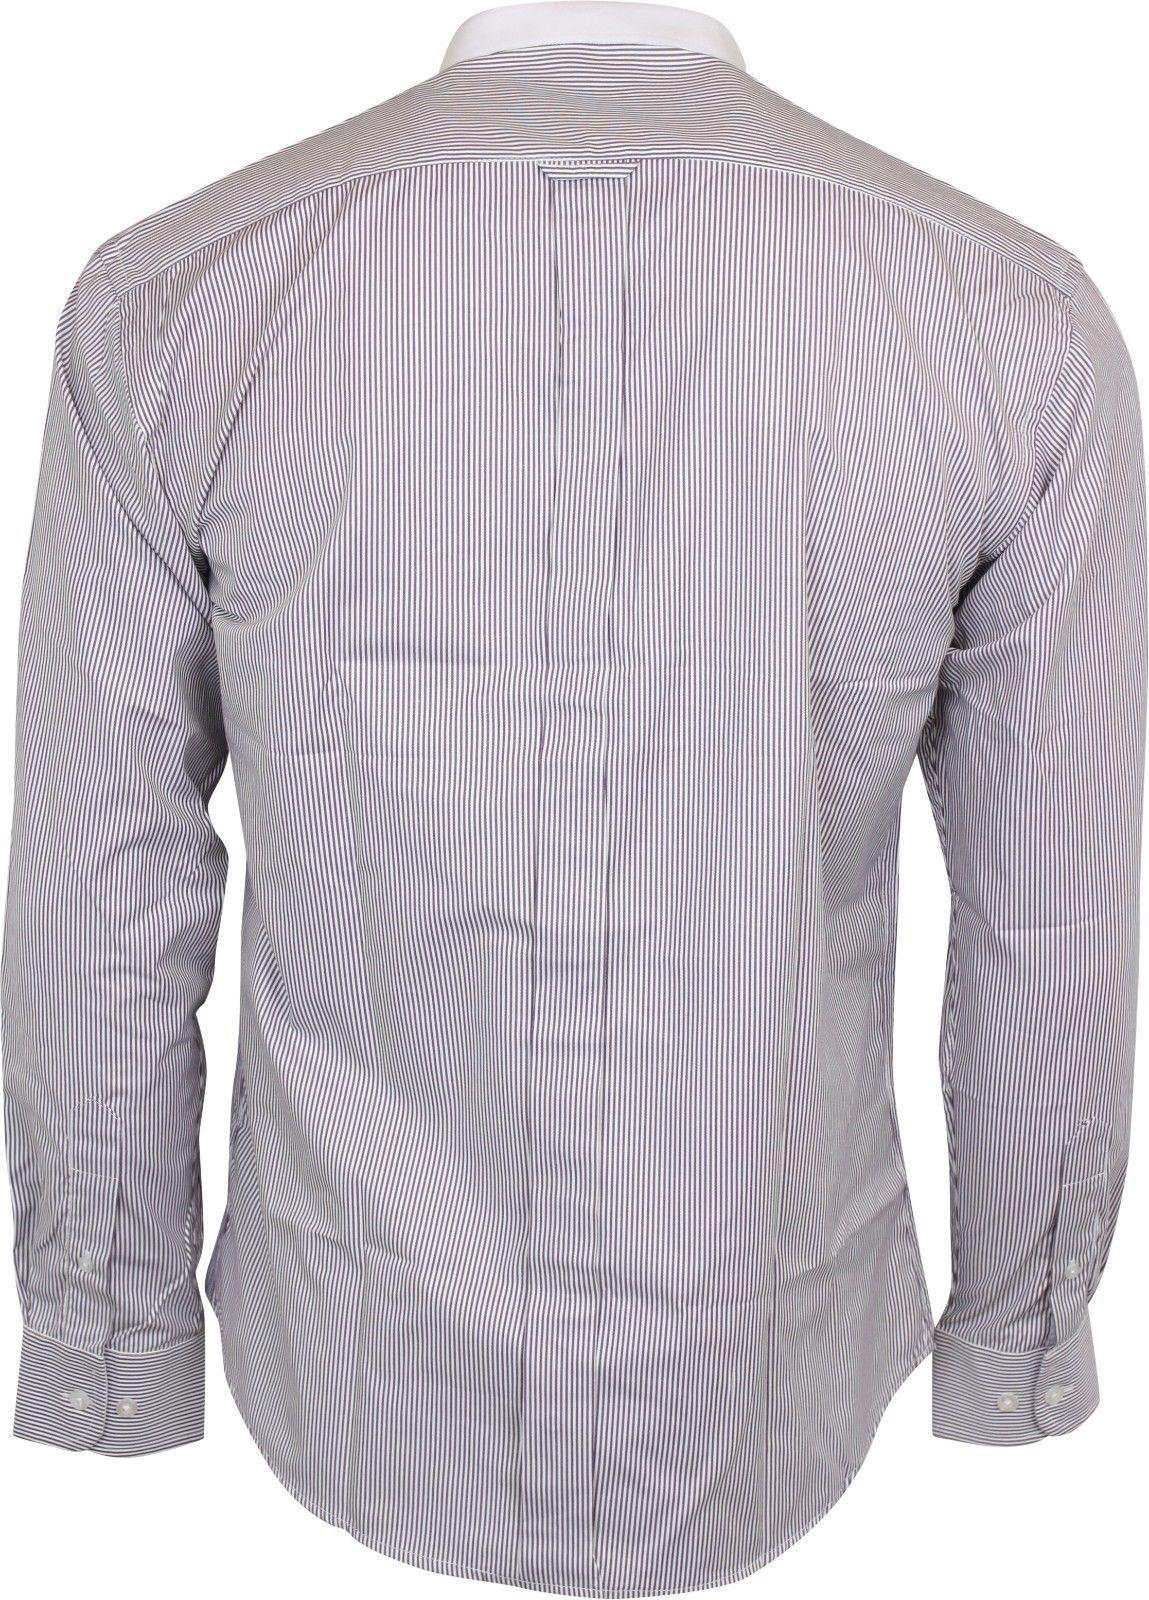 Relco Mens Classic Burgundy /& White Pinstripe Long Sleeved Grandad Shirt 50s 60s